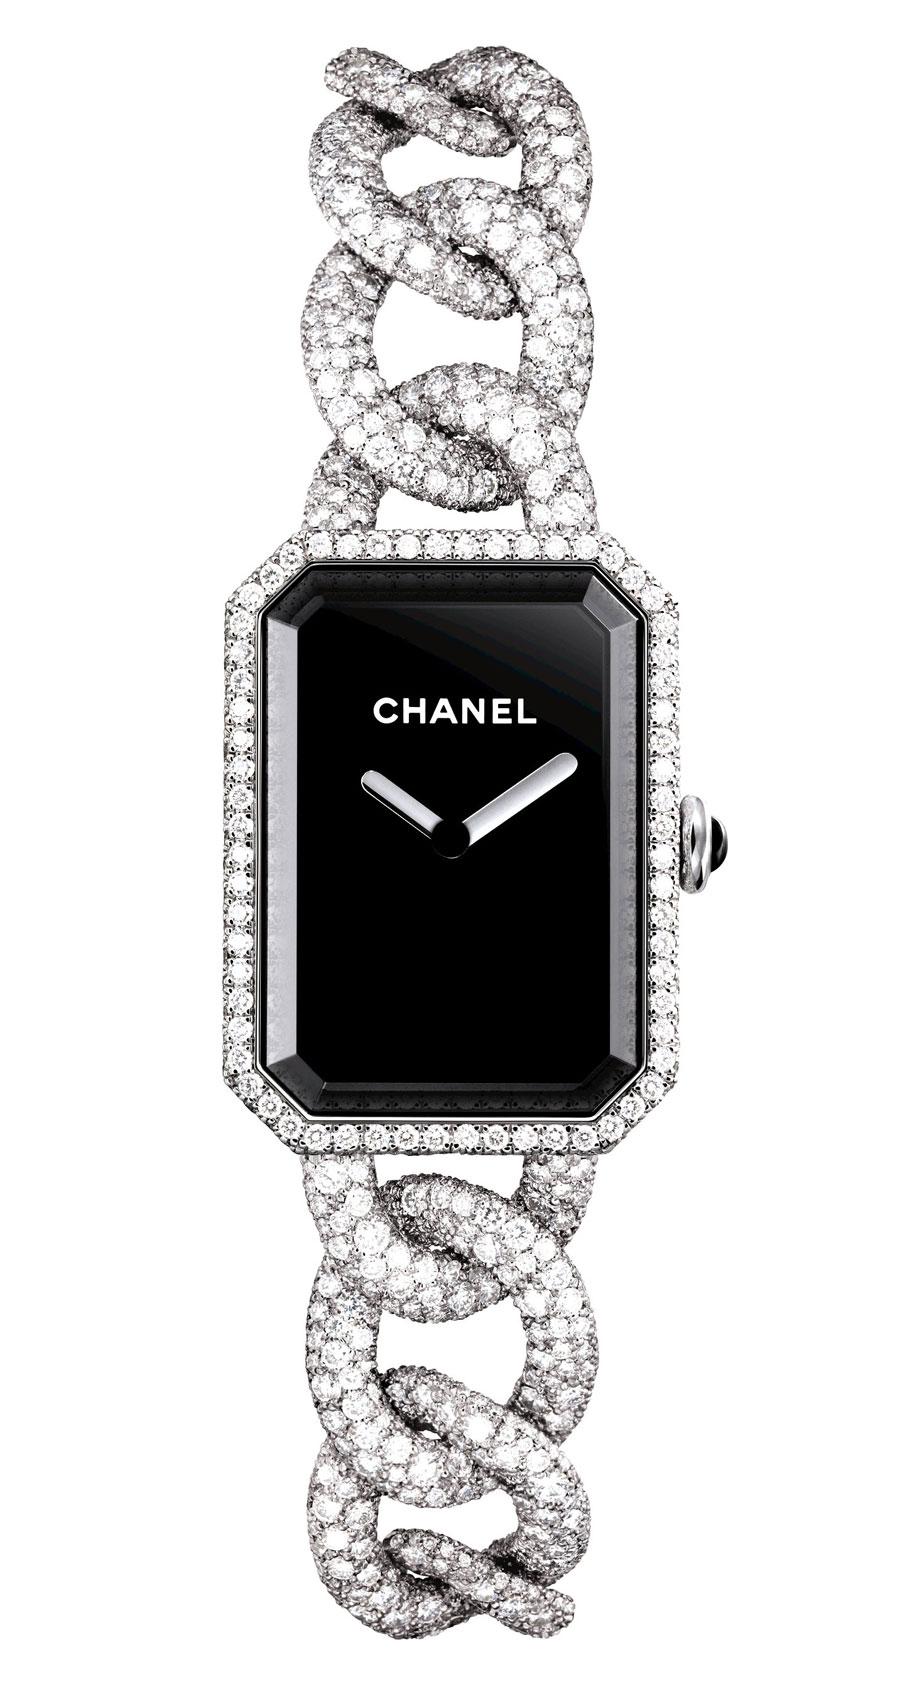 Chanel Diamond Watch